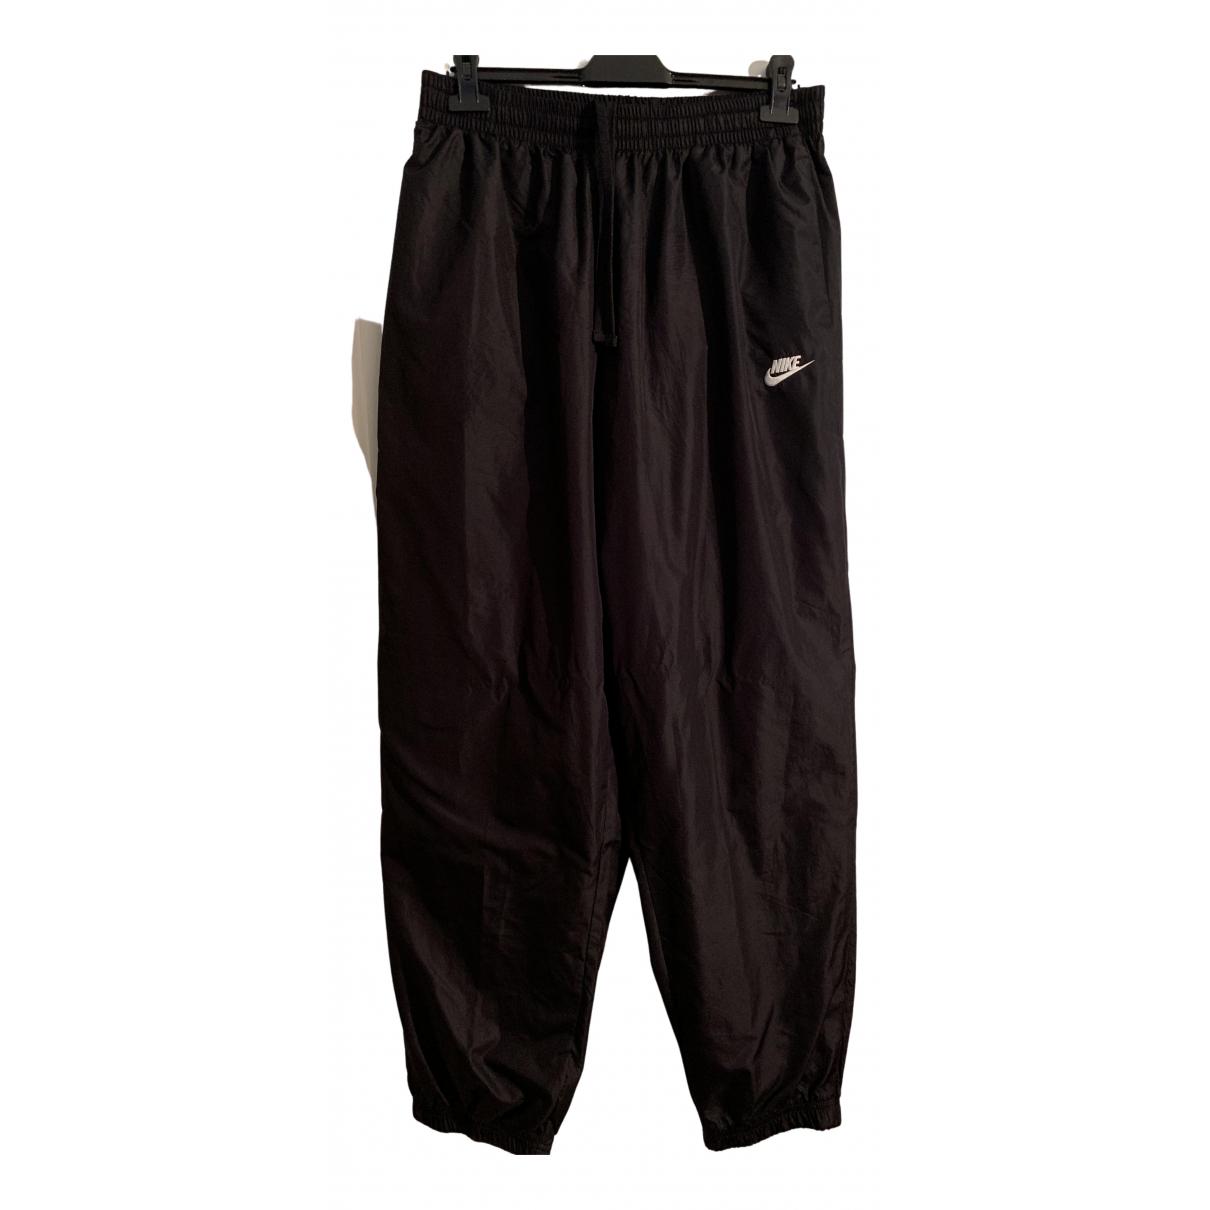 Nike \N Hose in  Schwarz Synthetik